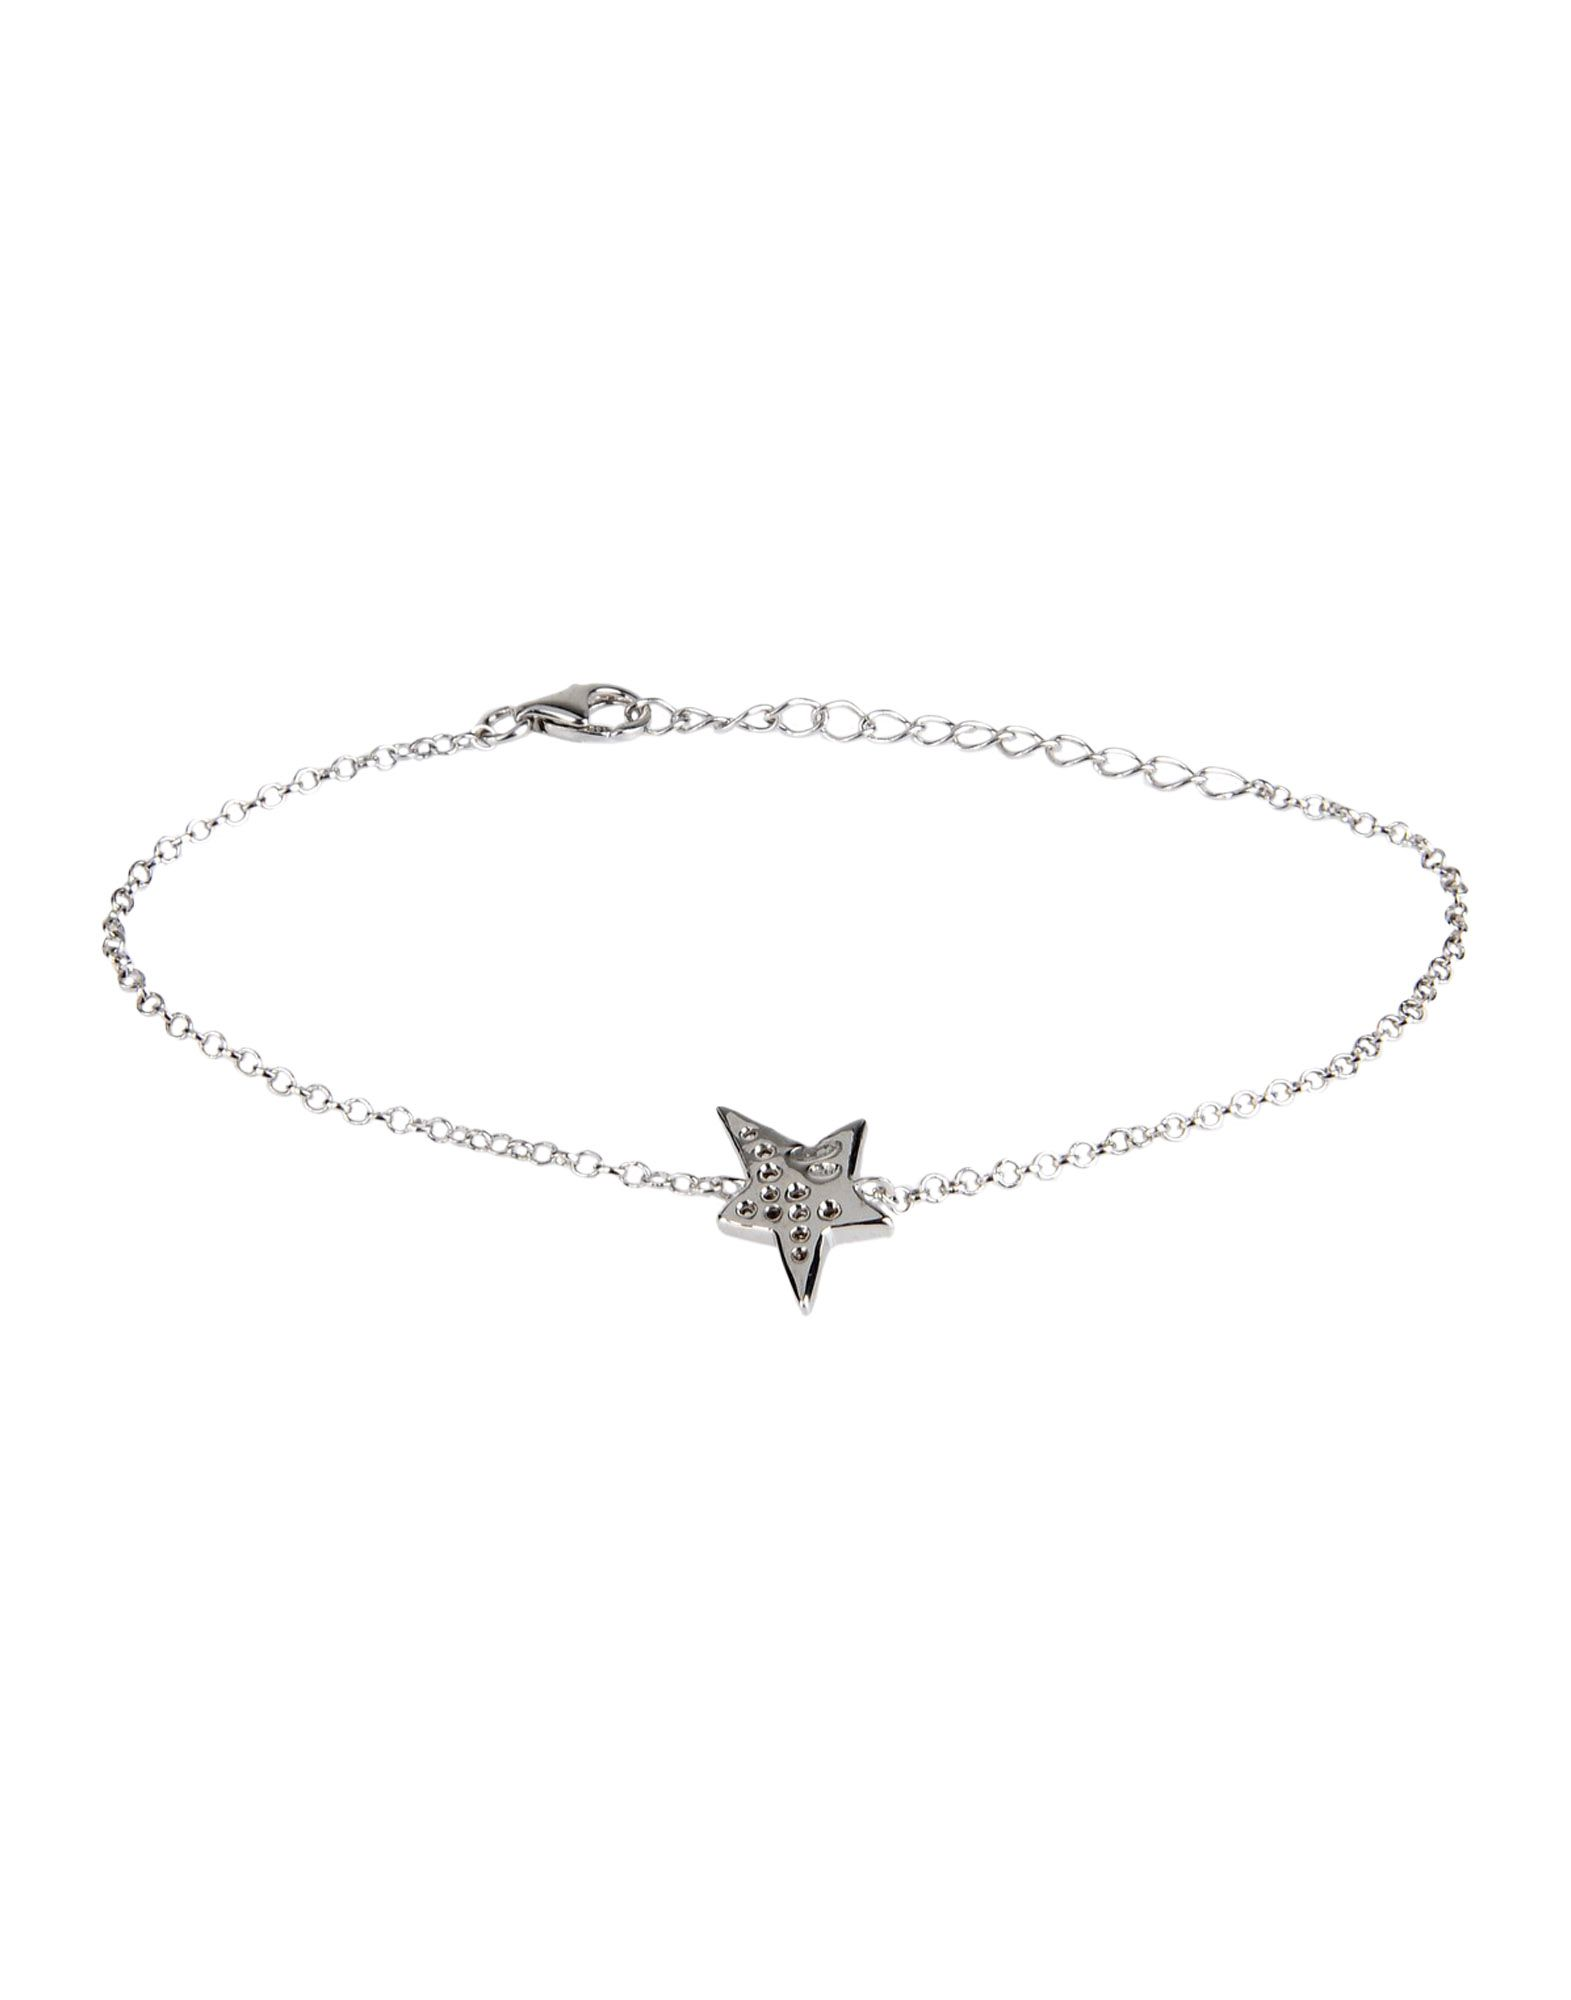 'Thierry Mugler Bracelets